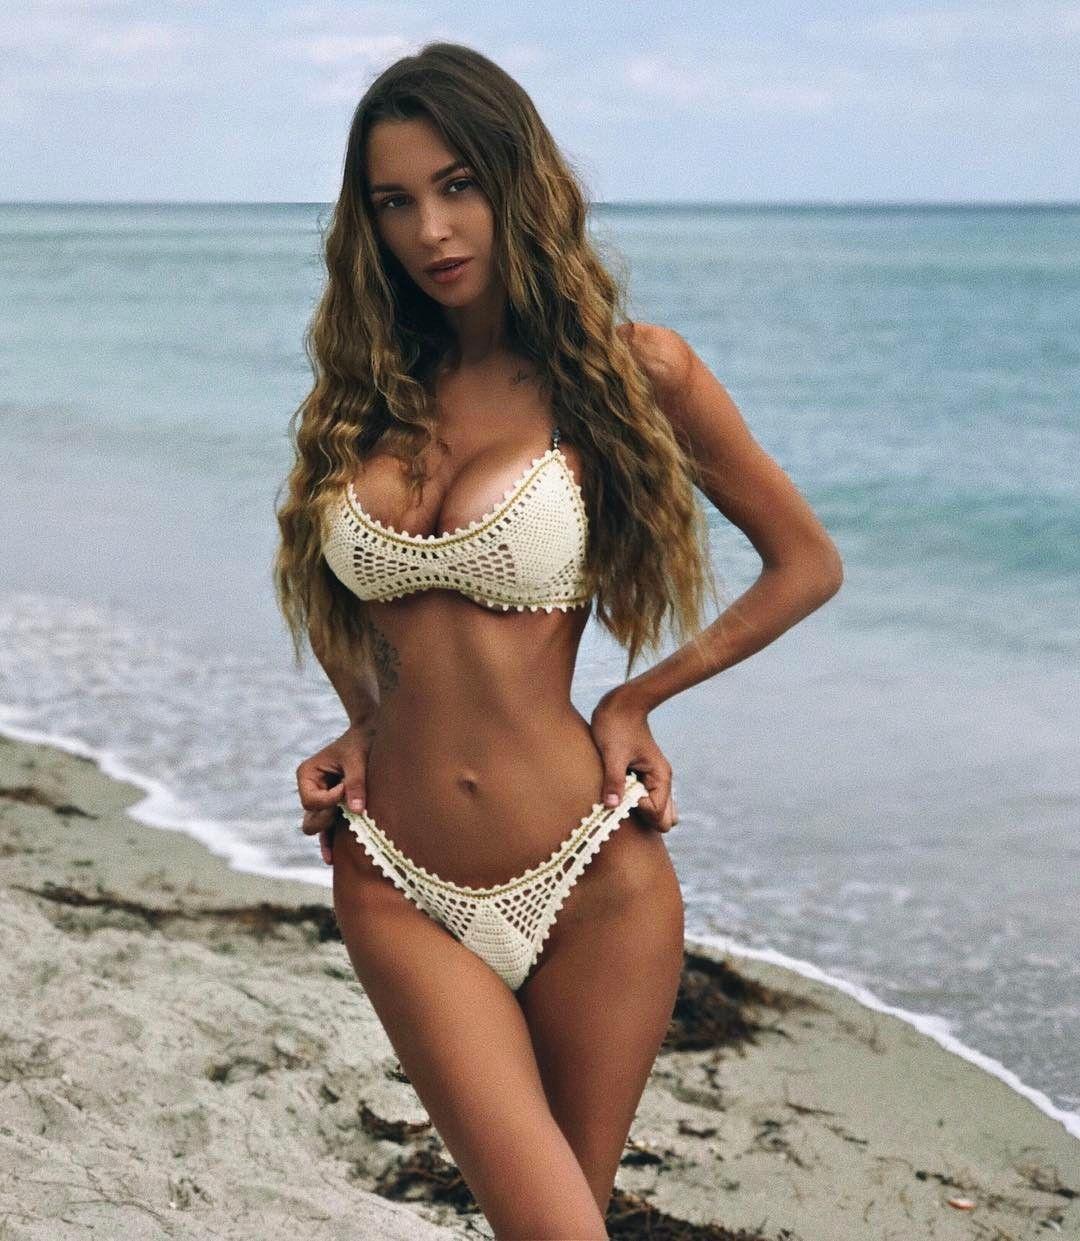 Video Lisa Appleton nude (13 photos), Sexy, Hot, Feet, in bikini 2020